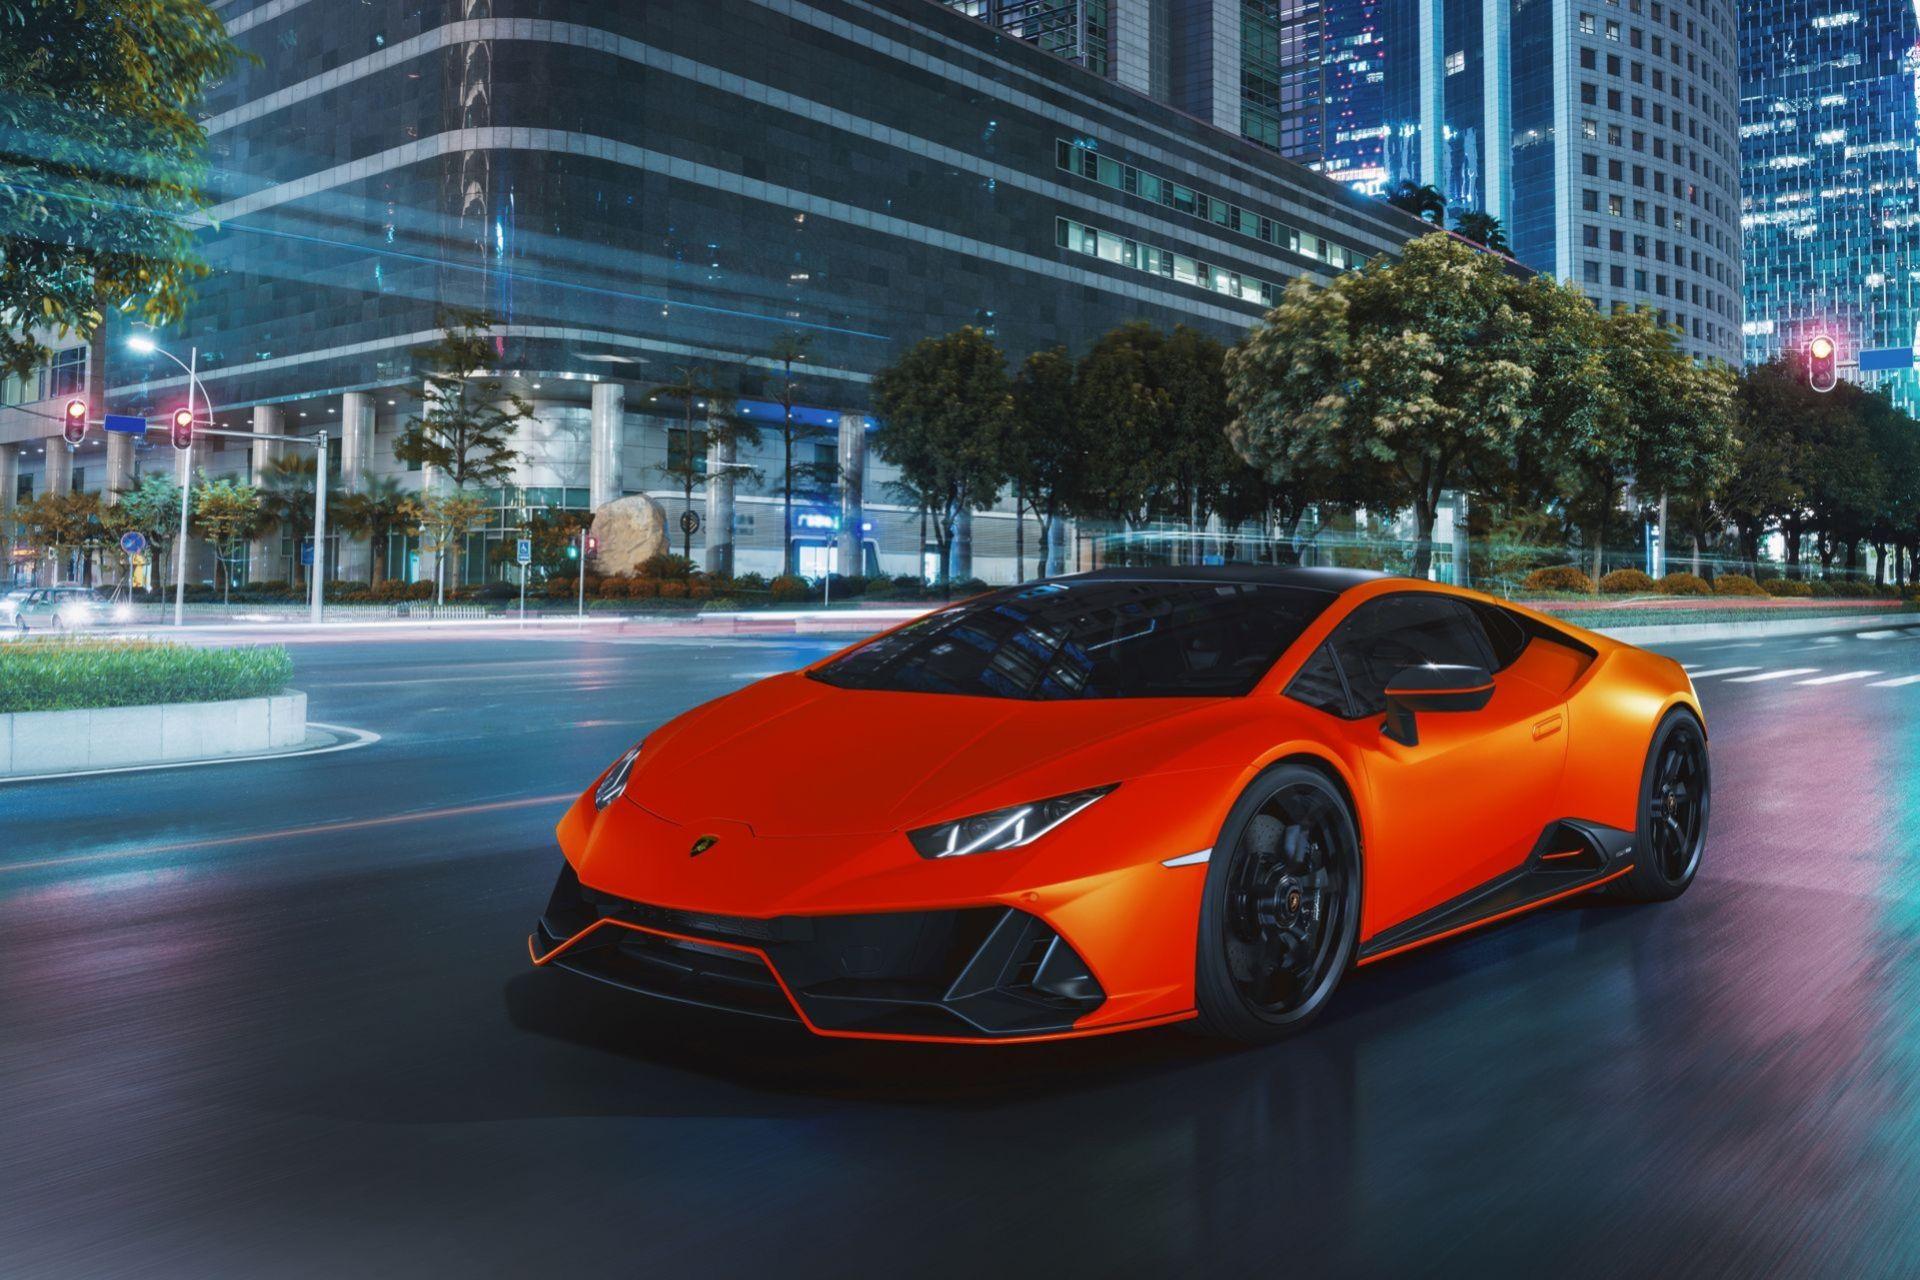 Lamborghini Huracán Evo i fem stycken nya kulörer